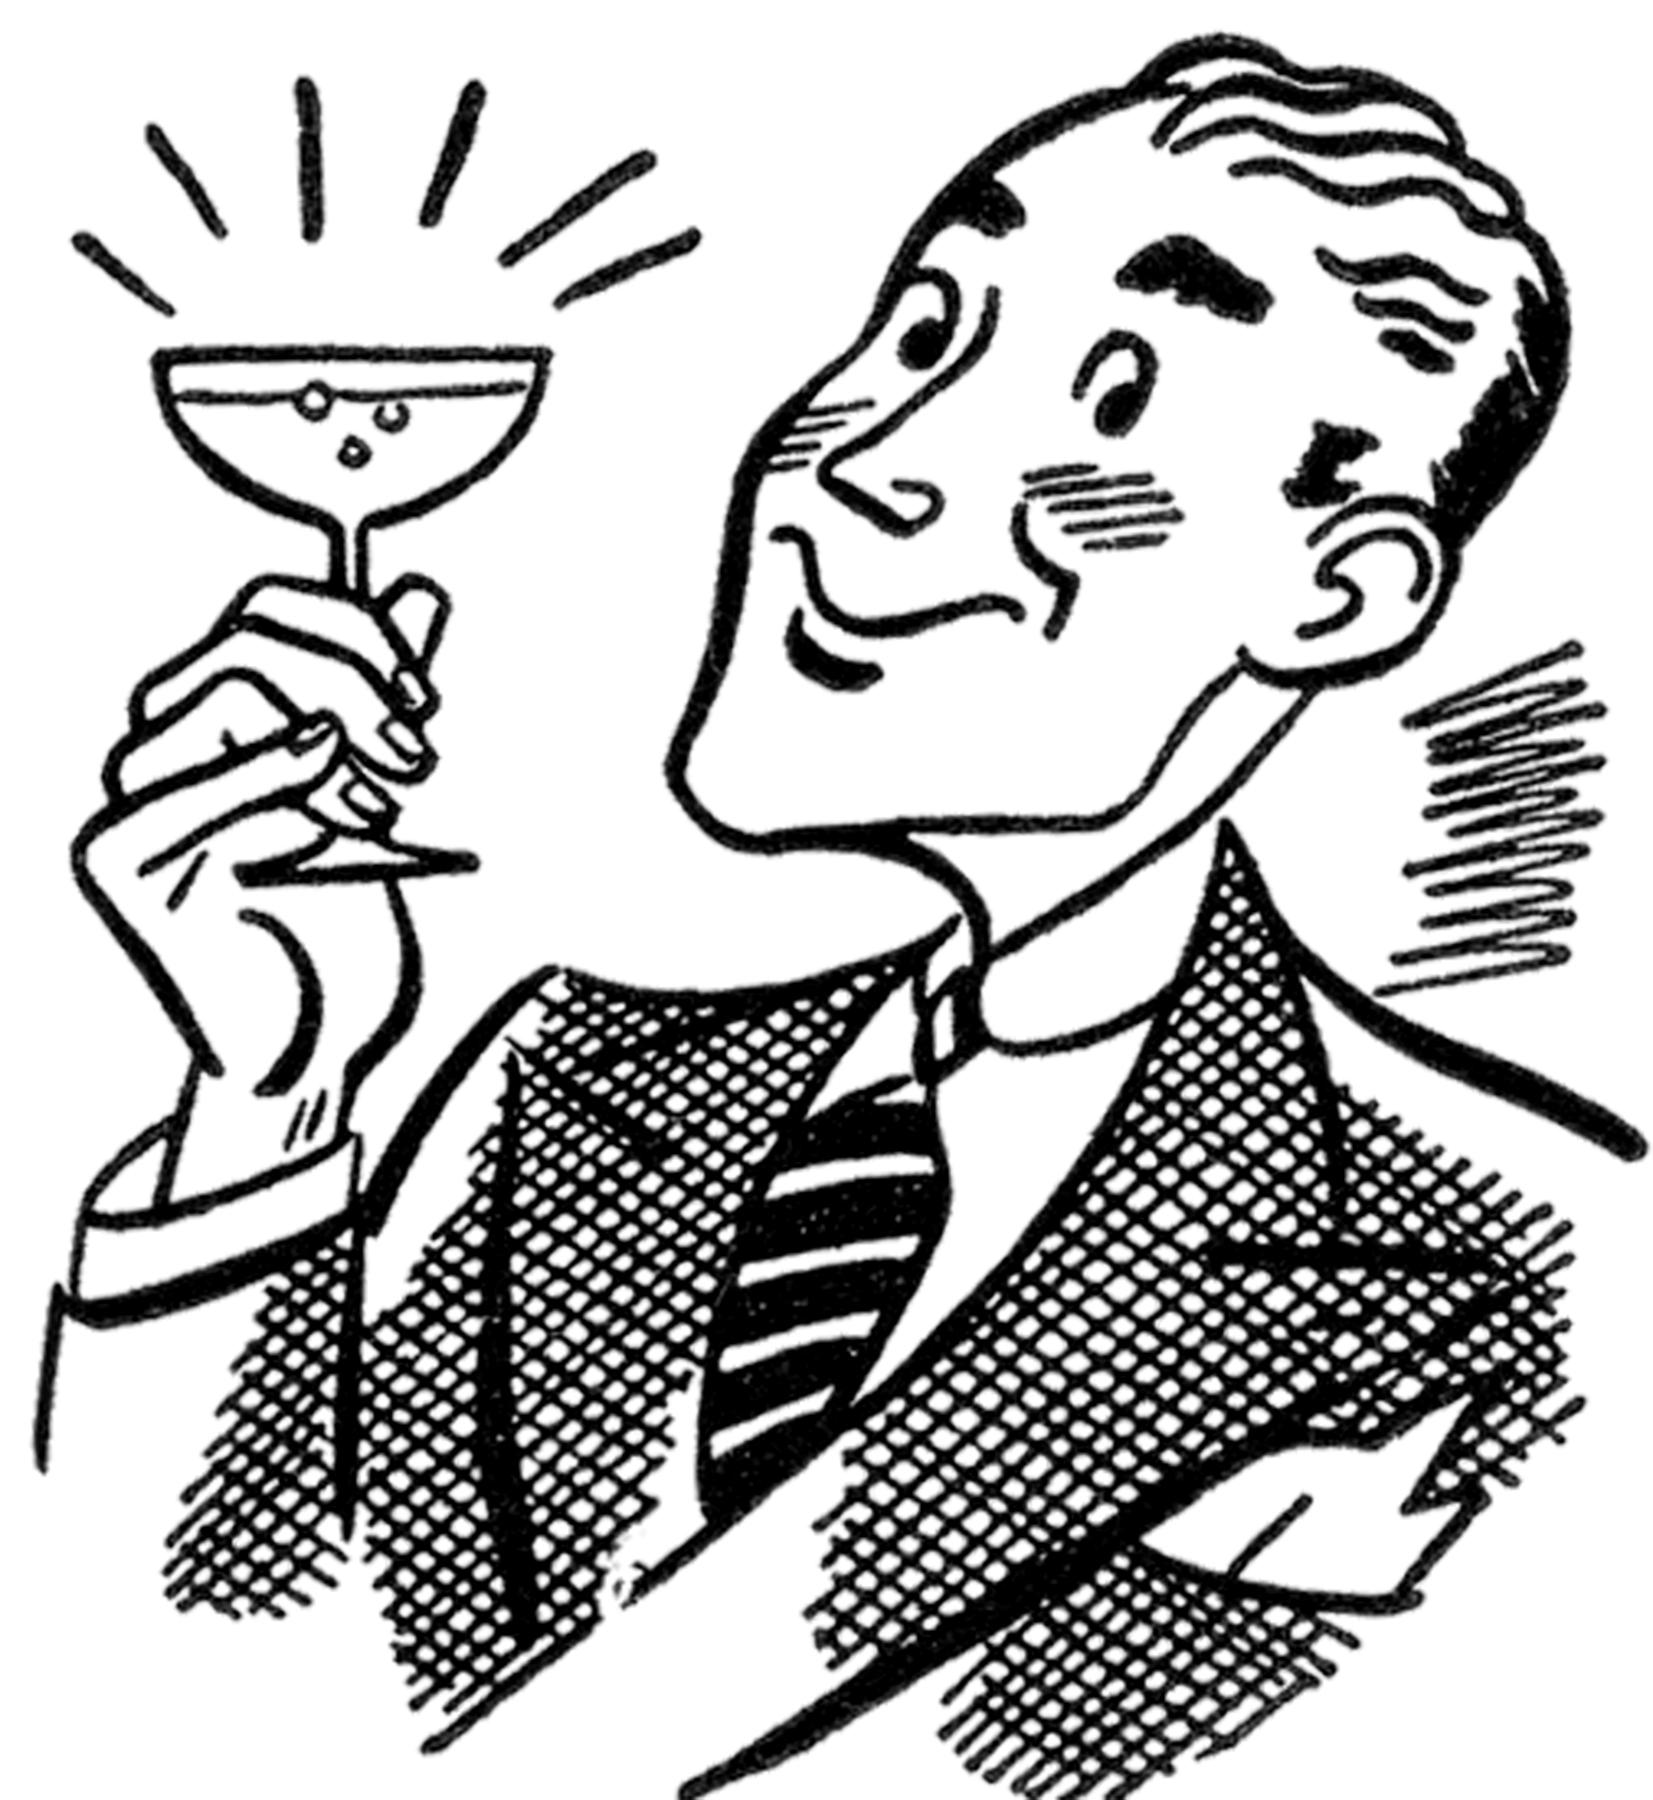 Retro Martini Man Image